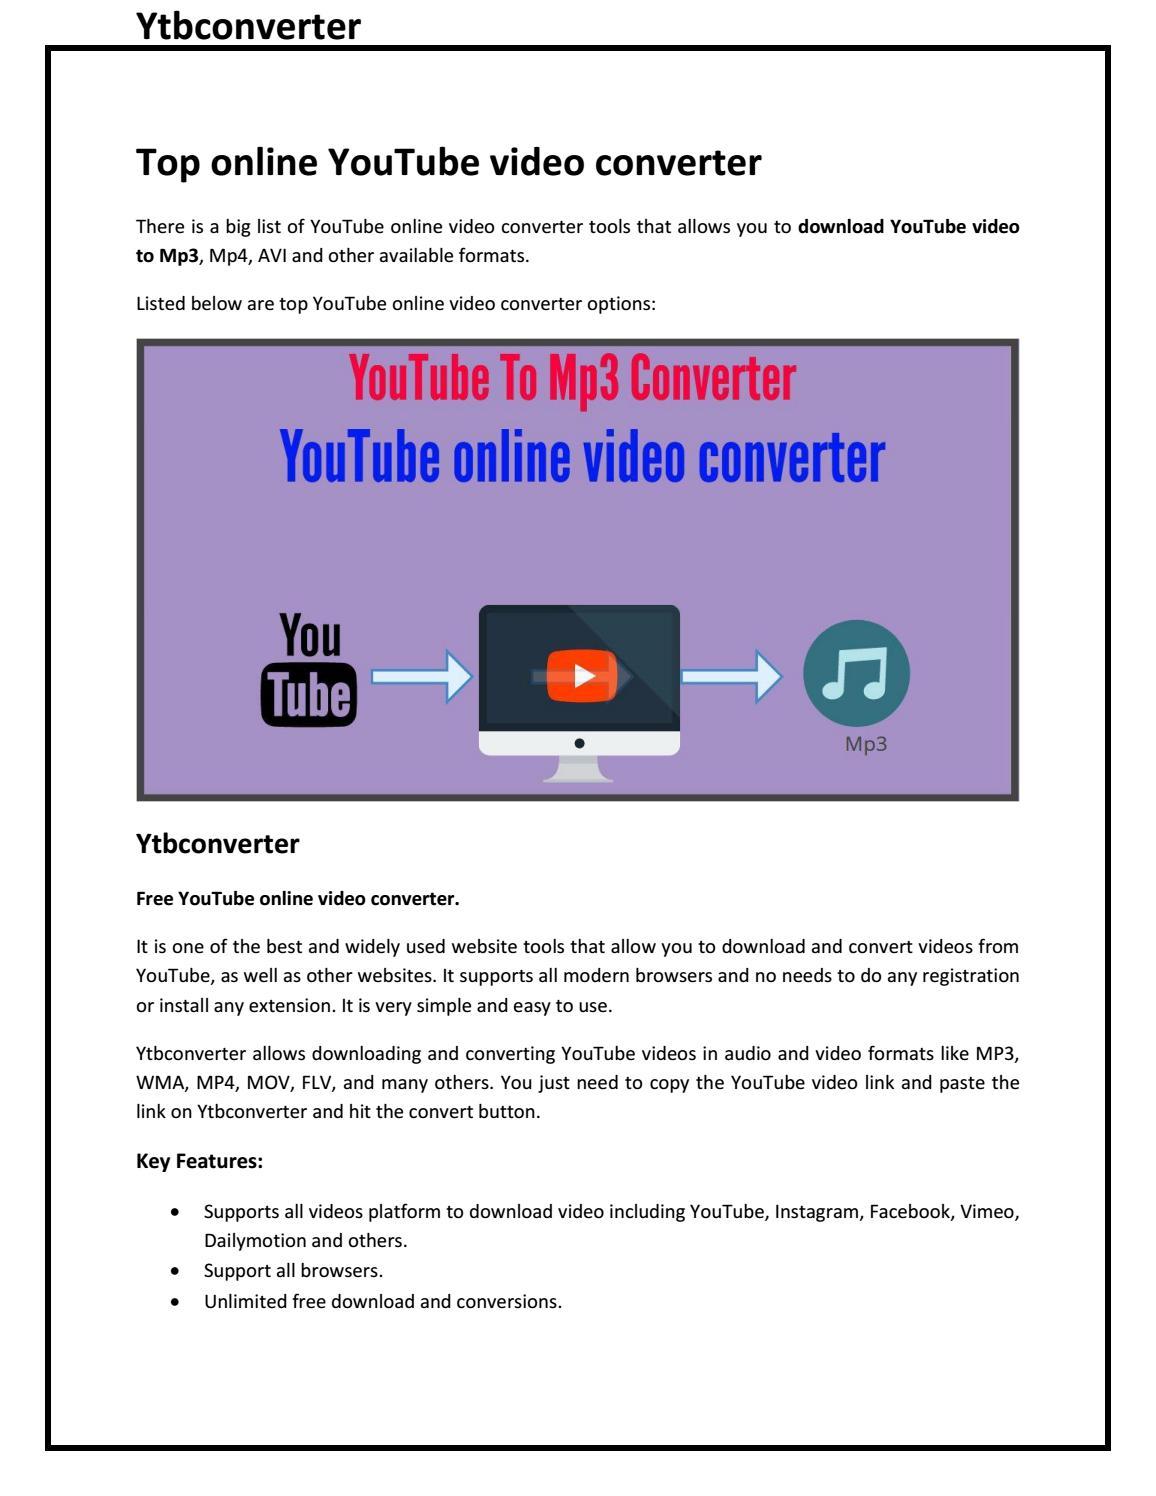 Top online YouTube video converter by akshaytrank - issuu